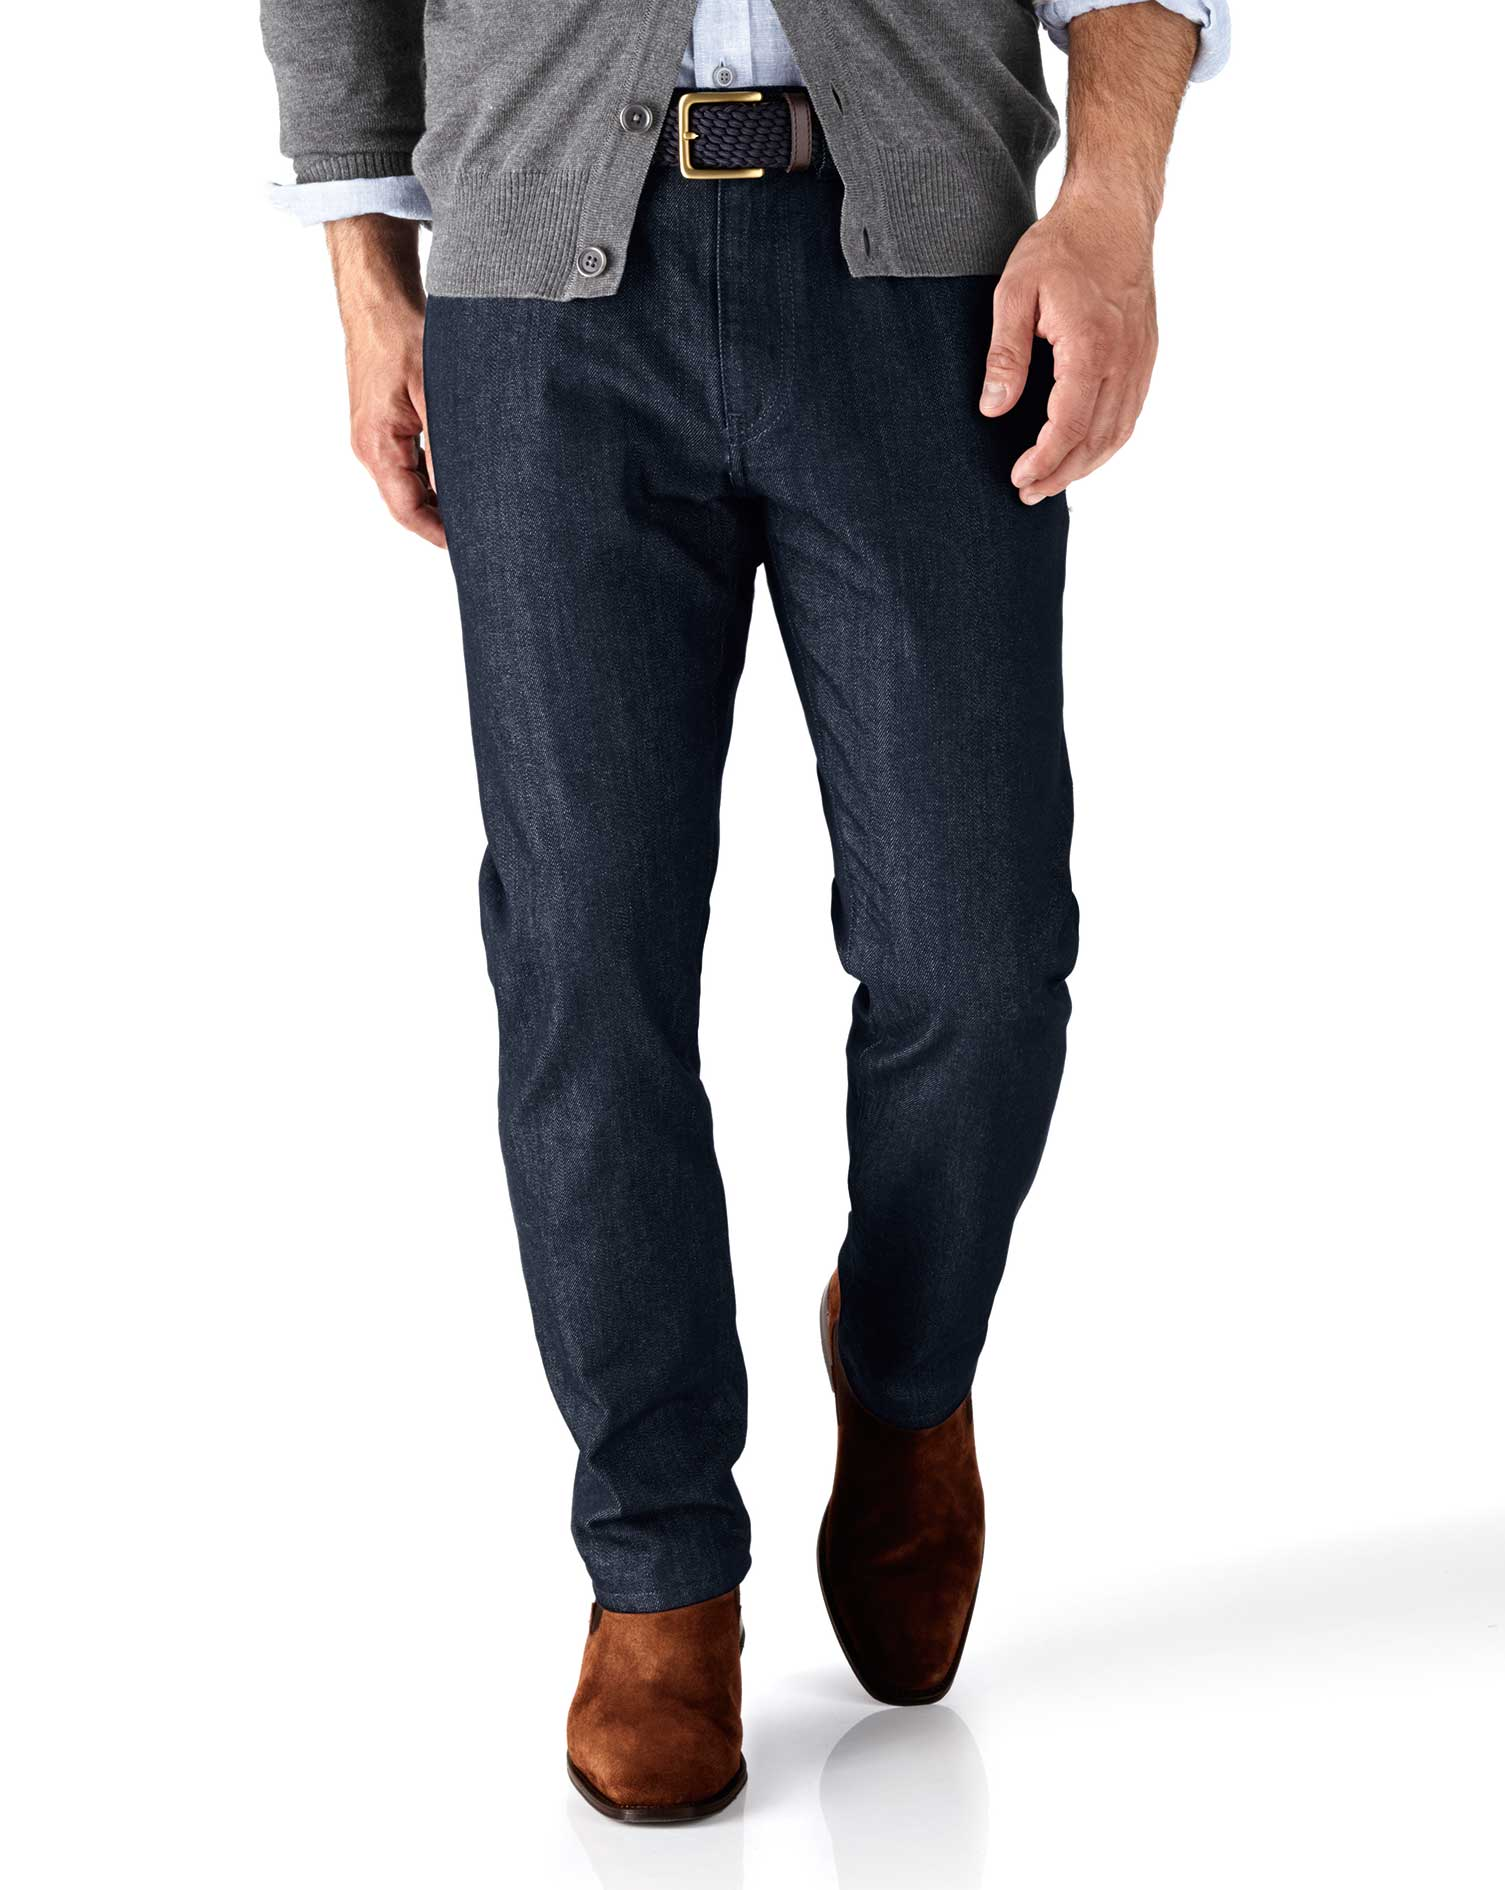 Dark Blue Slim Fit 5 Pocket Denim Jeans Size W40 L32 by Charles Tyrwhitt